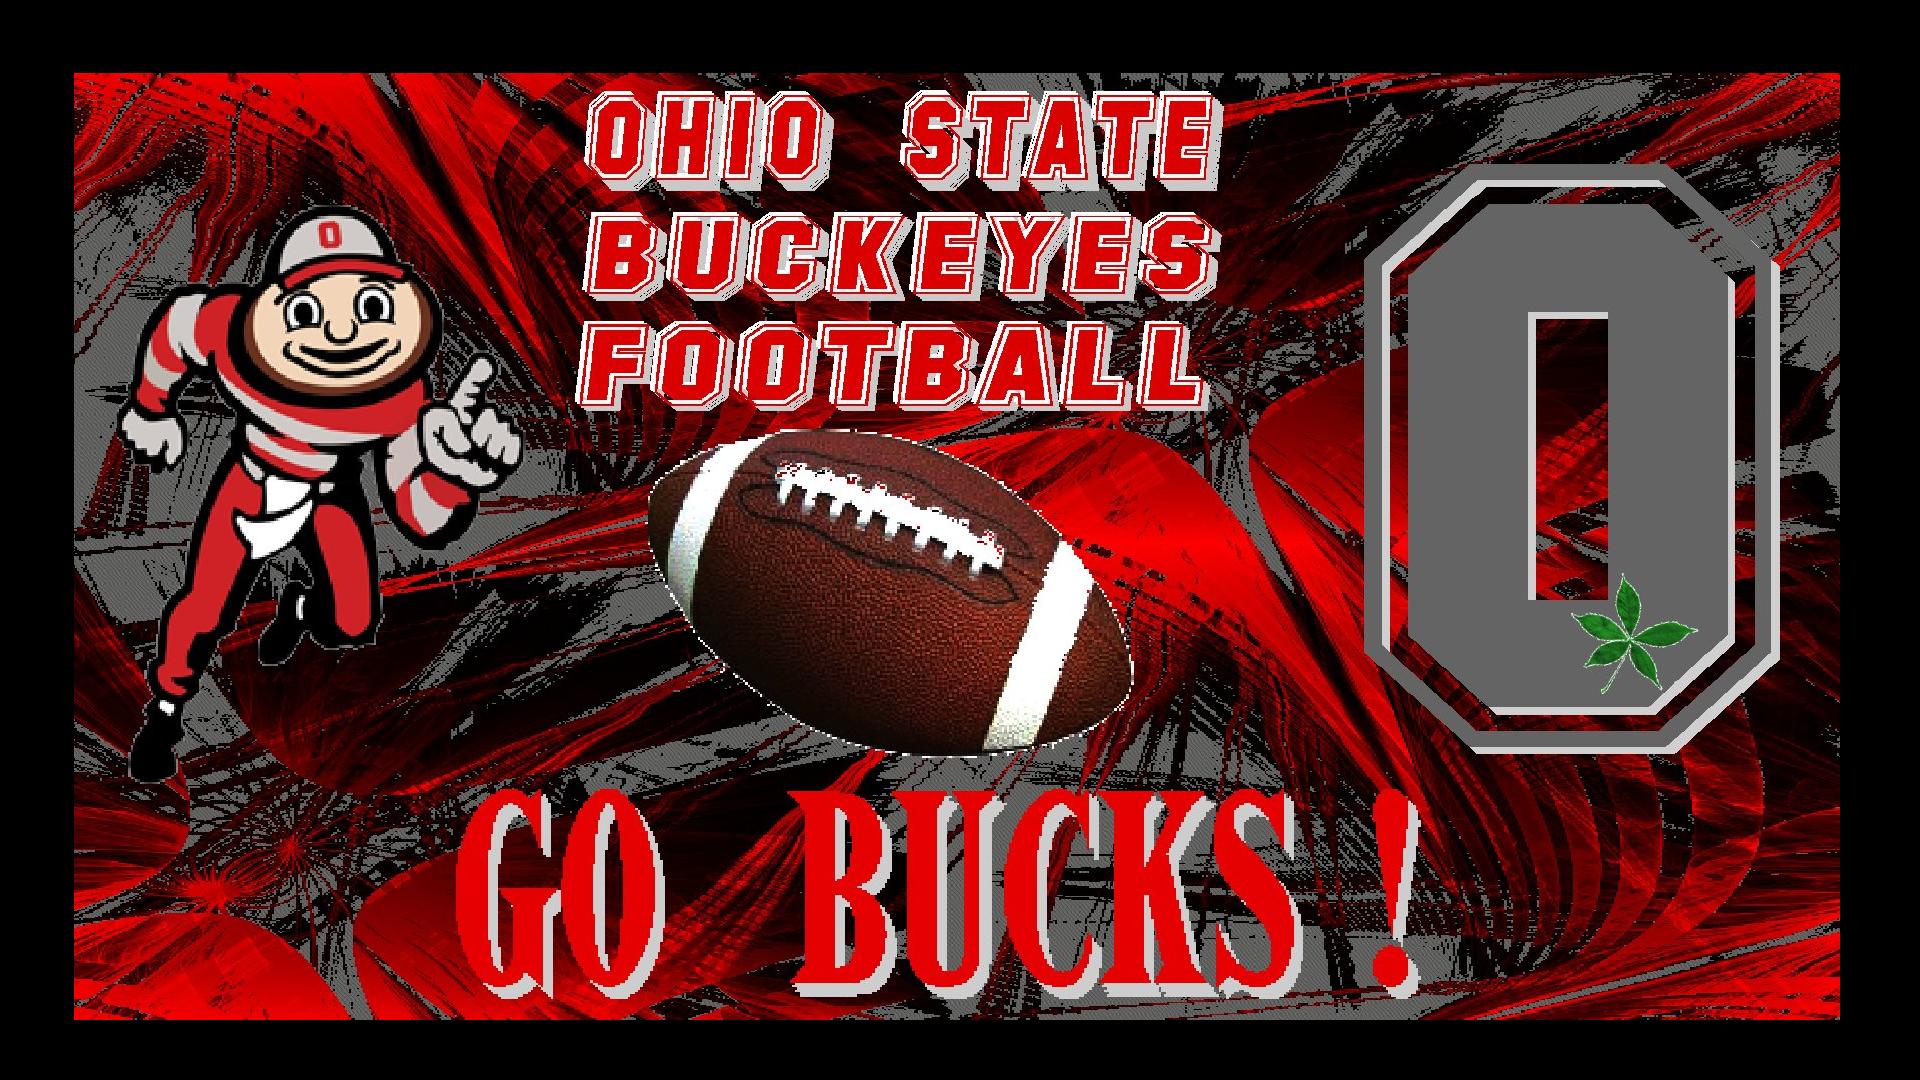 Ohio State Football OHIO STATE BUCKEYES FOOTBALL, GO BUCKS!